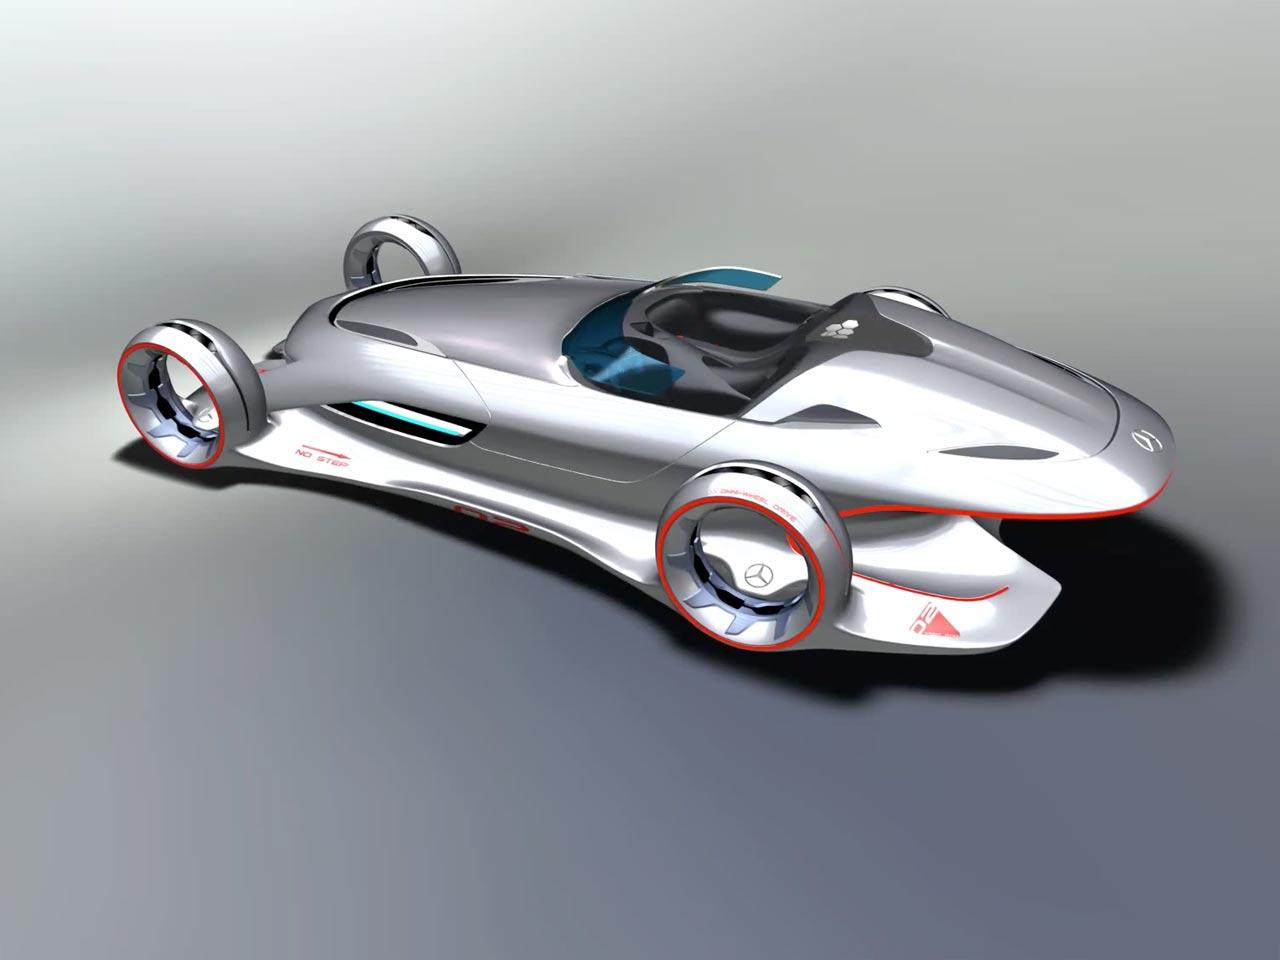 Mercedes benz silver arrow concept imagini si video for Mercedes benz silver lightning